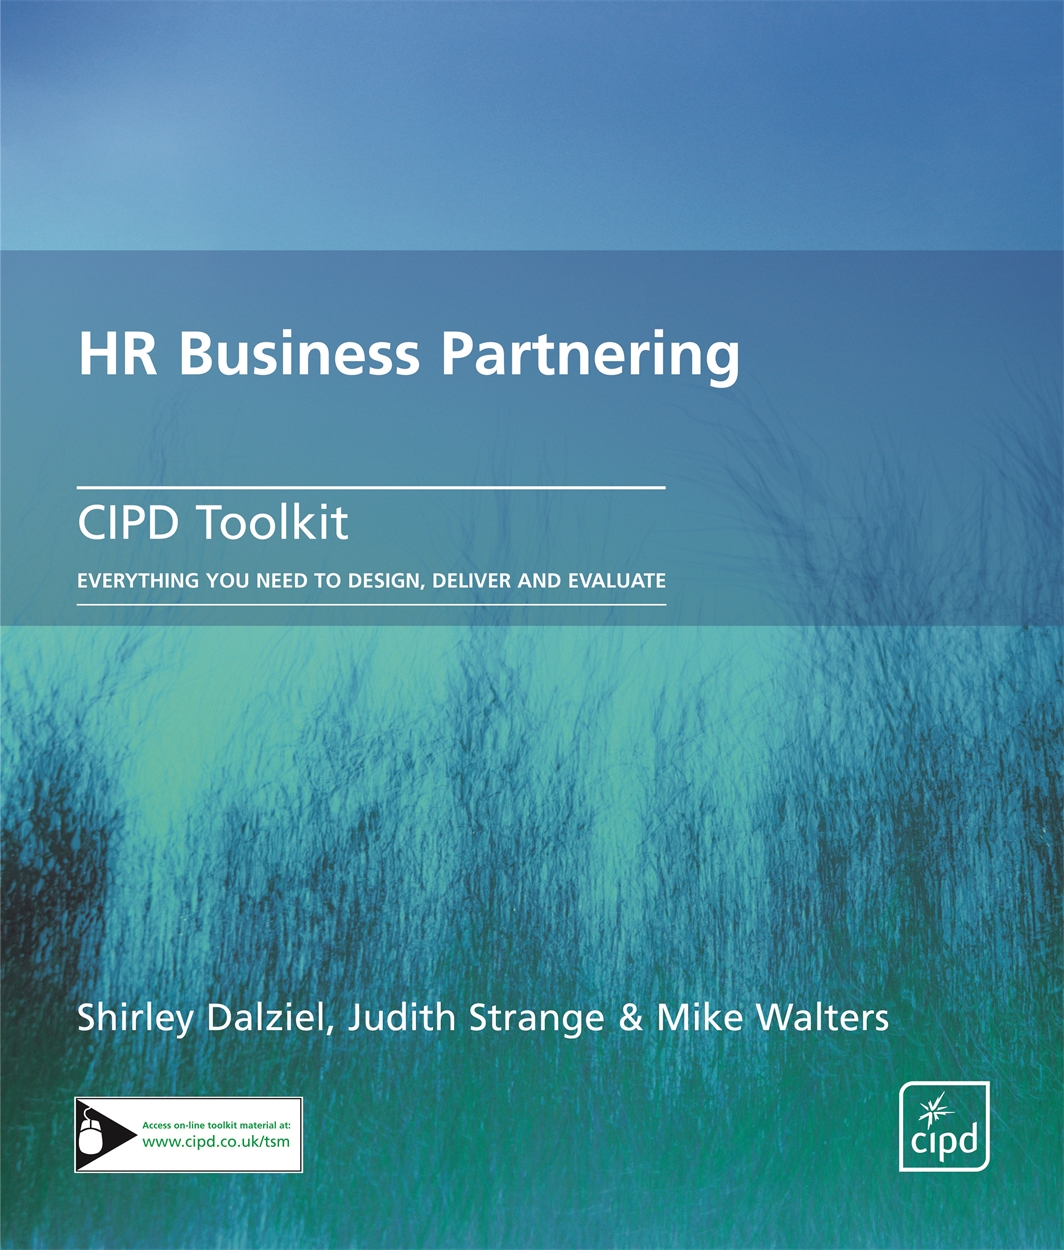 HR Business Partnering (9781843981541)